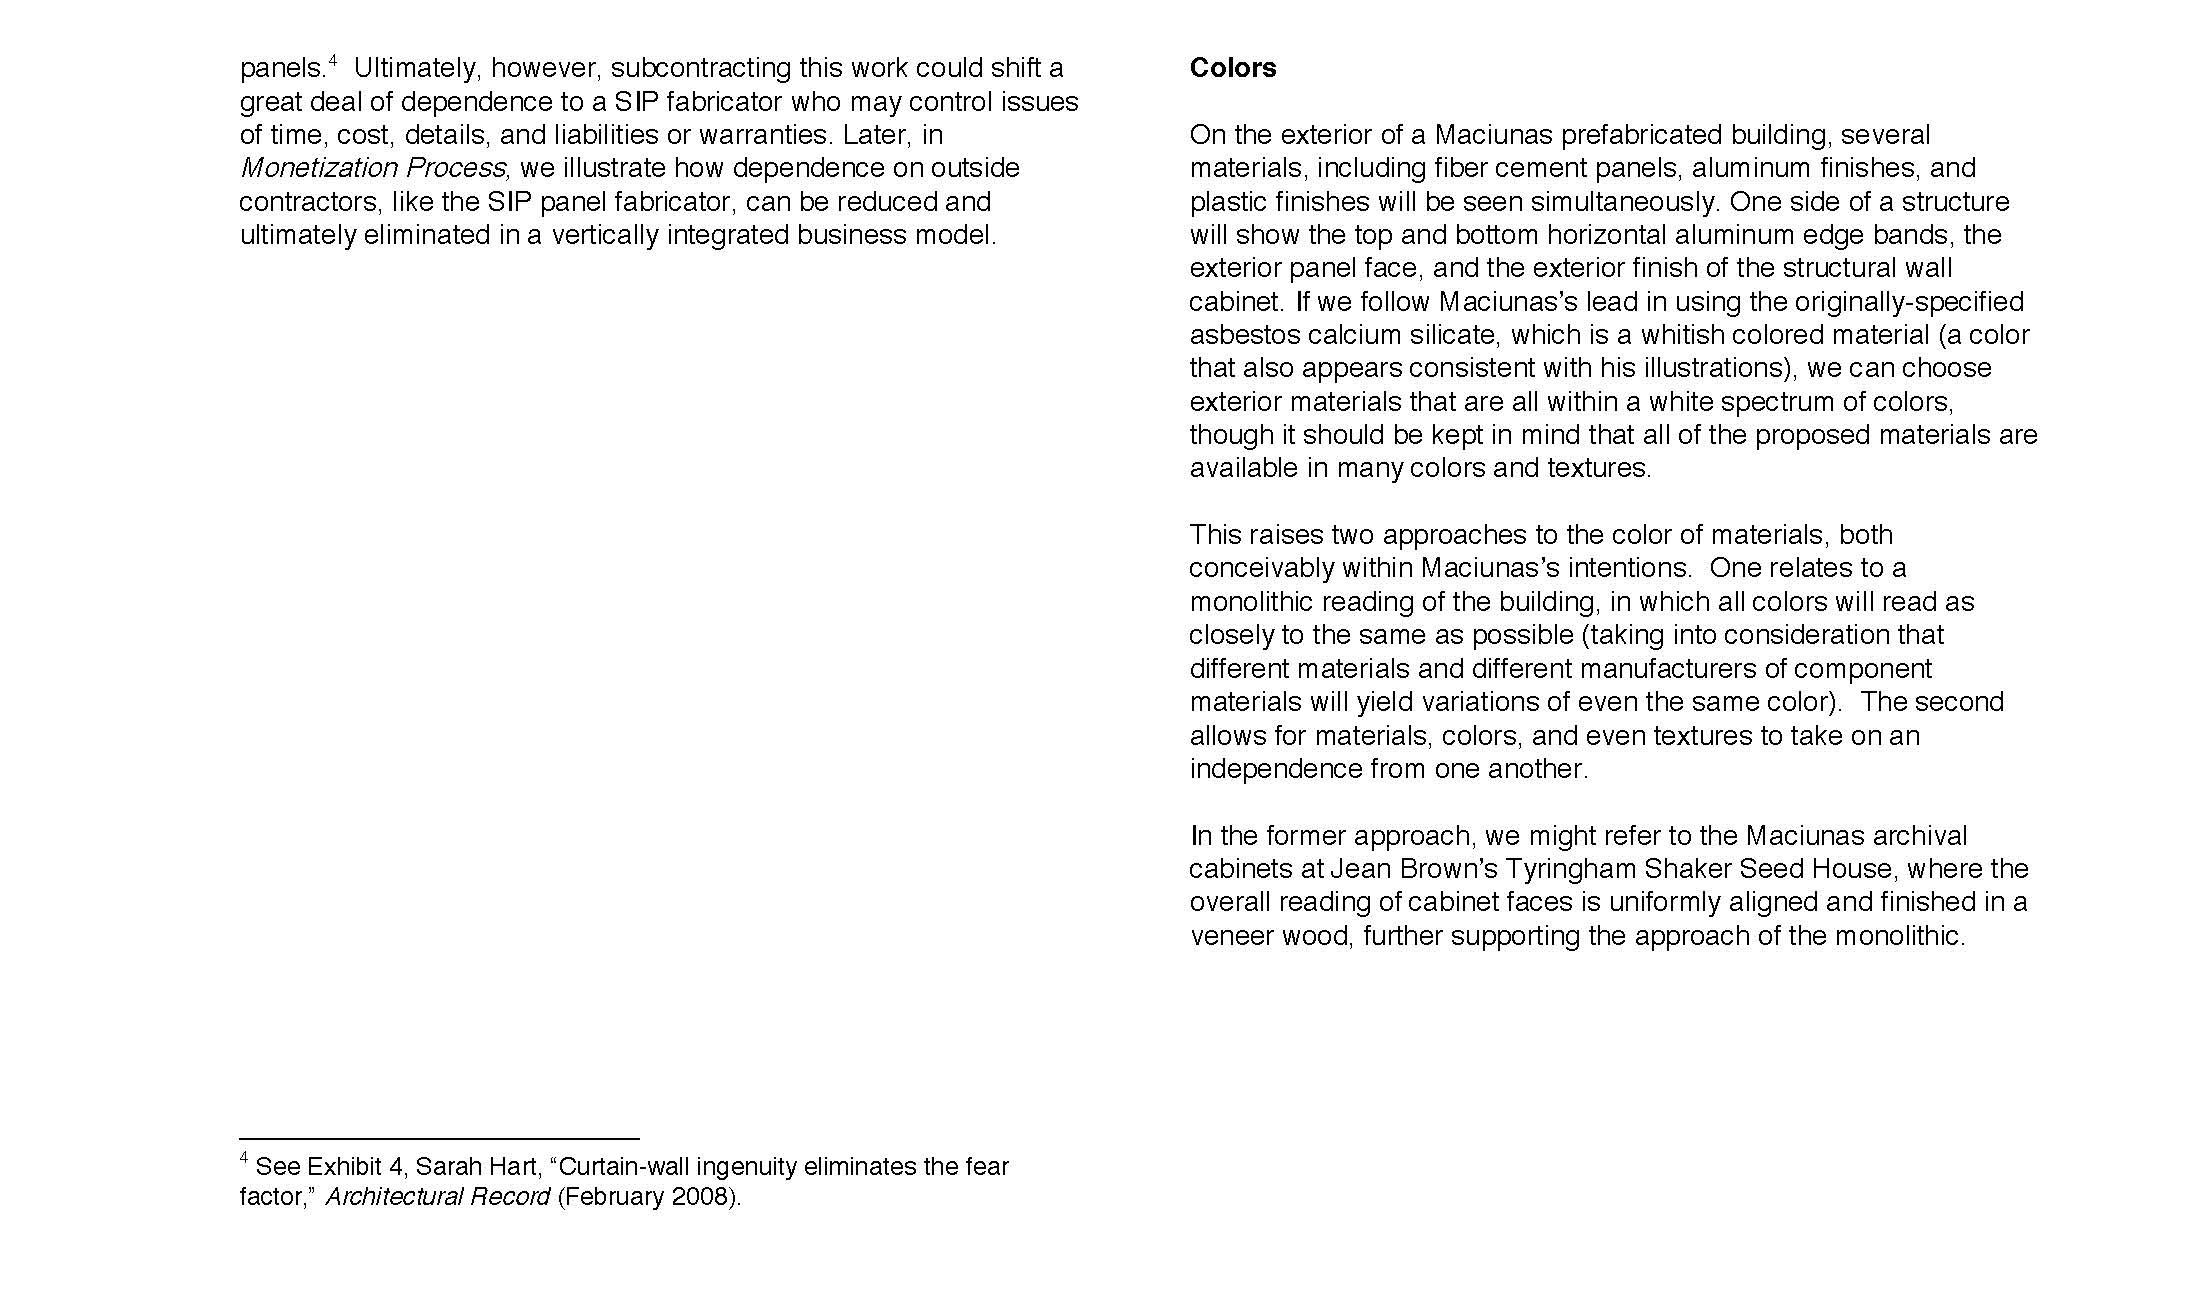 Maciunas Assessment Report 0509_Page_41.jpg